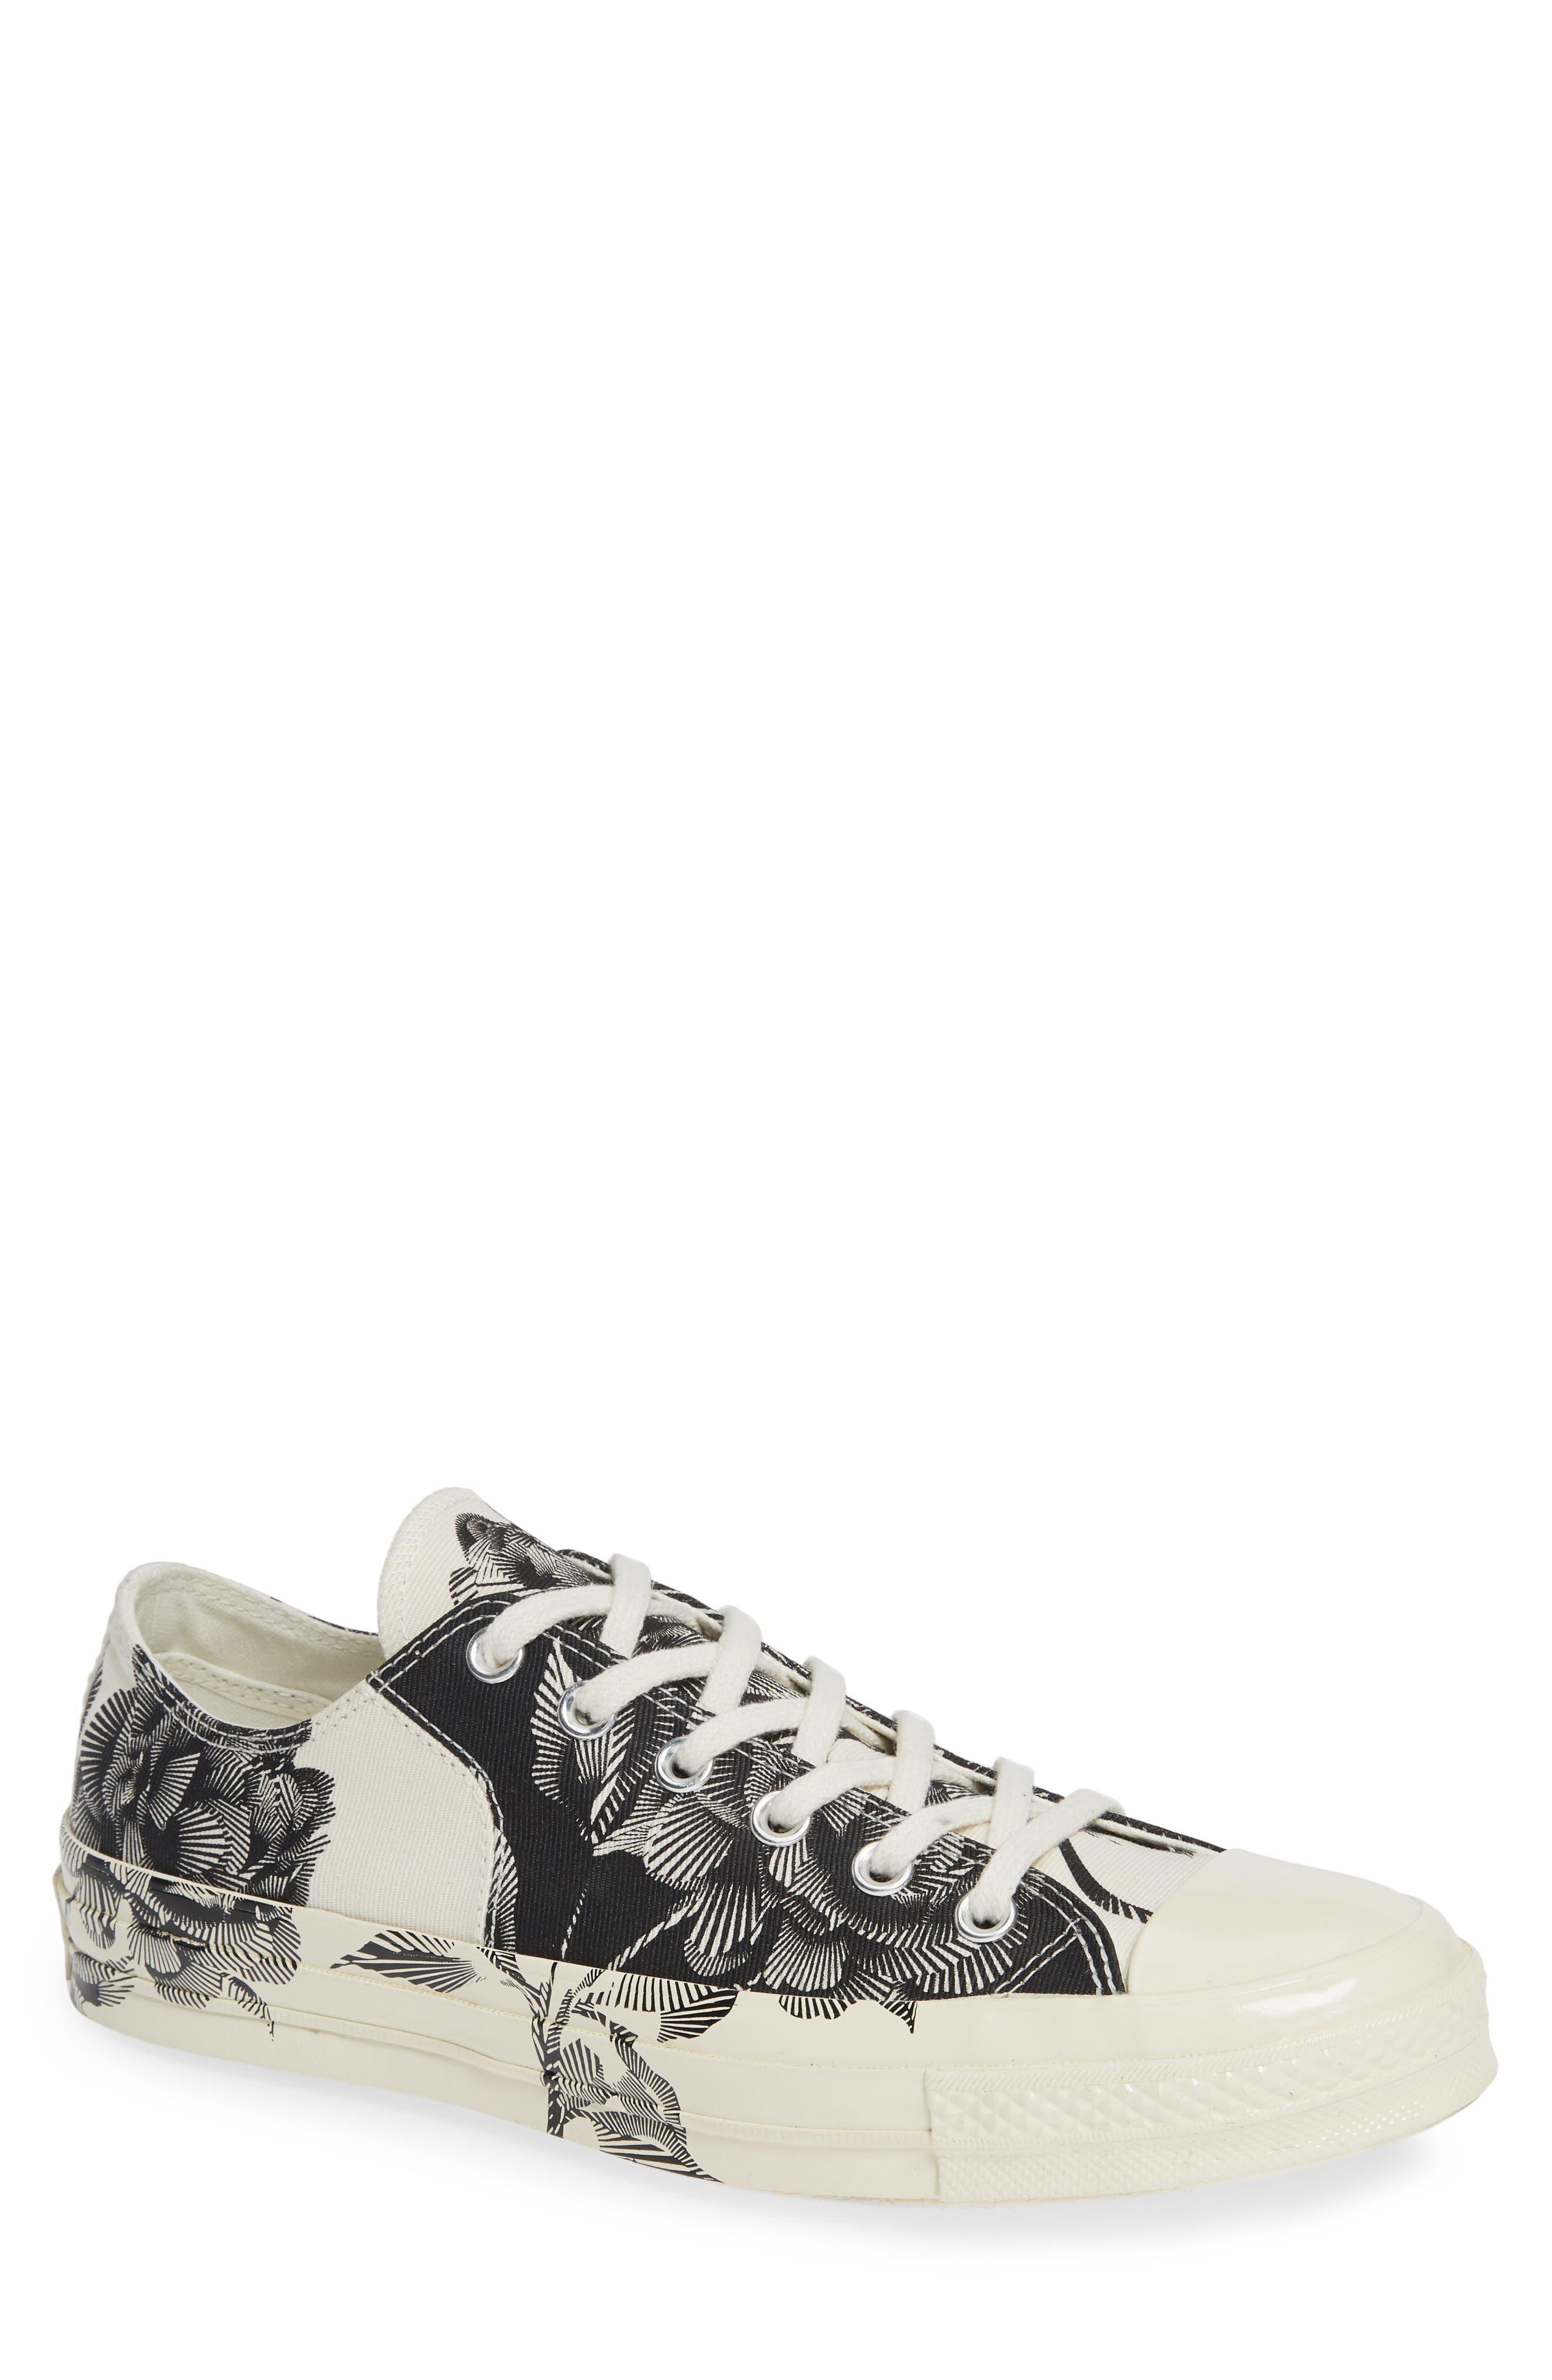 CT 70 Peony Low Top Sneaker,                             Main thumbnail 1, color,                             001